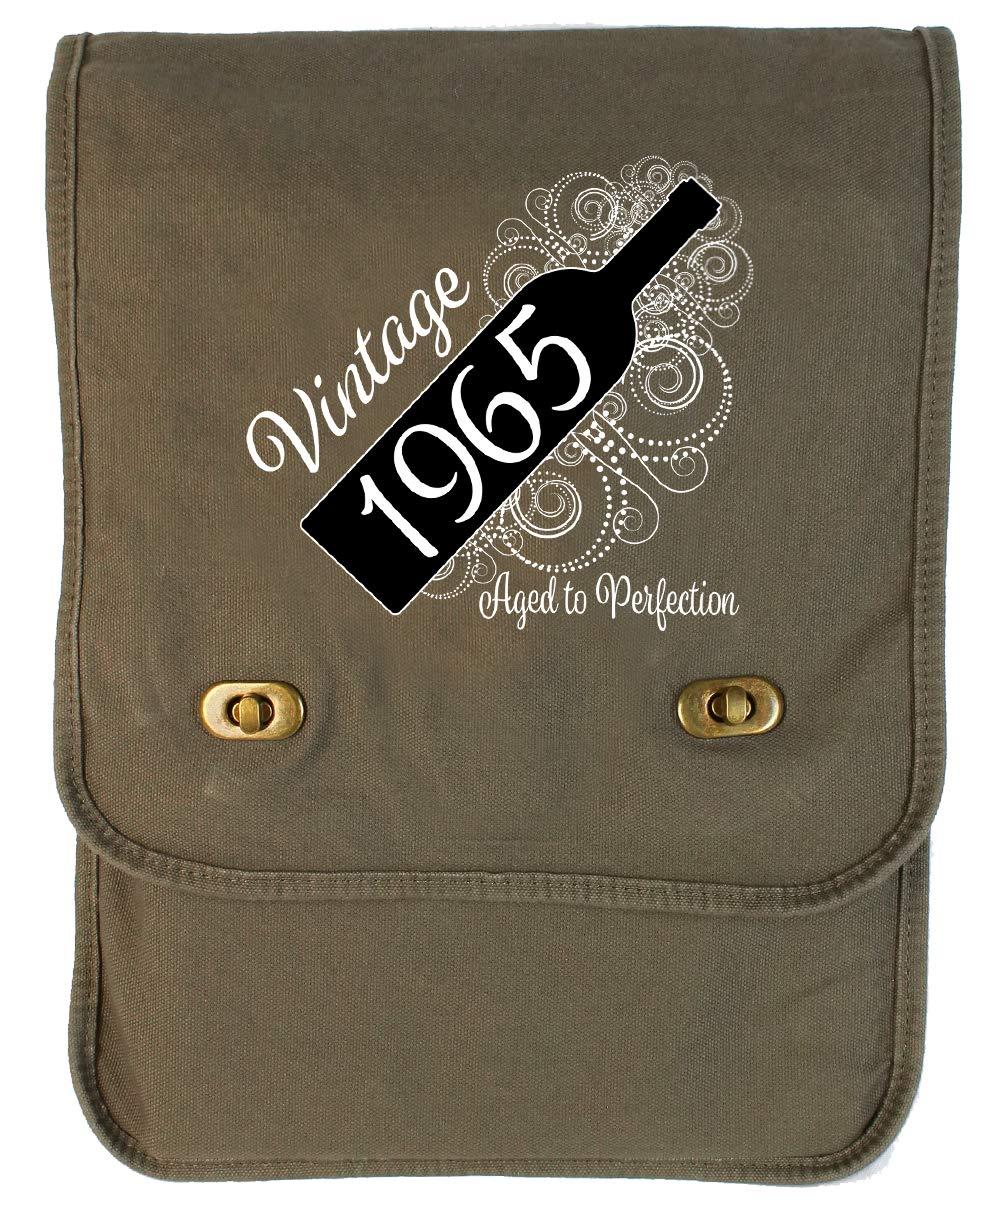 Aged Like a Fine Wine Khaki Green Raw Edge Canvas Messenger Bag Tenacitee Born in 1965